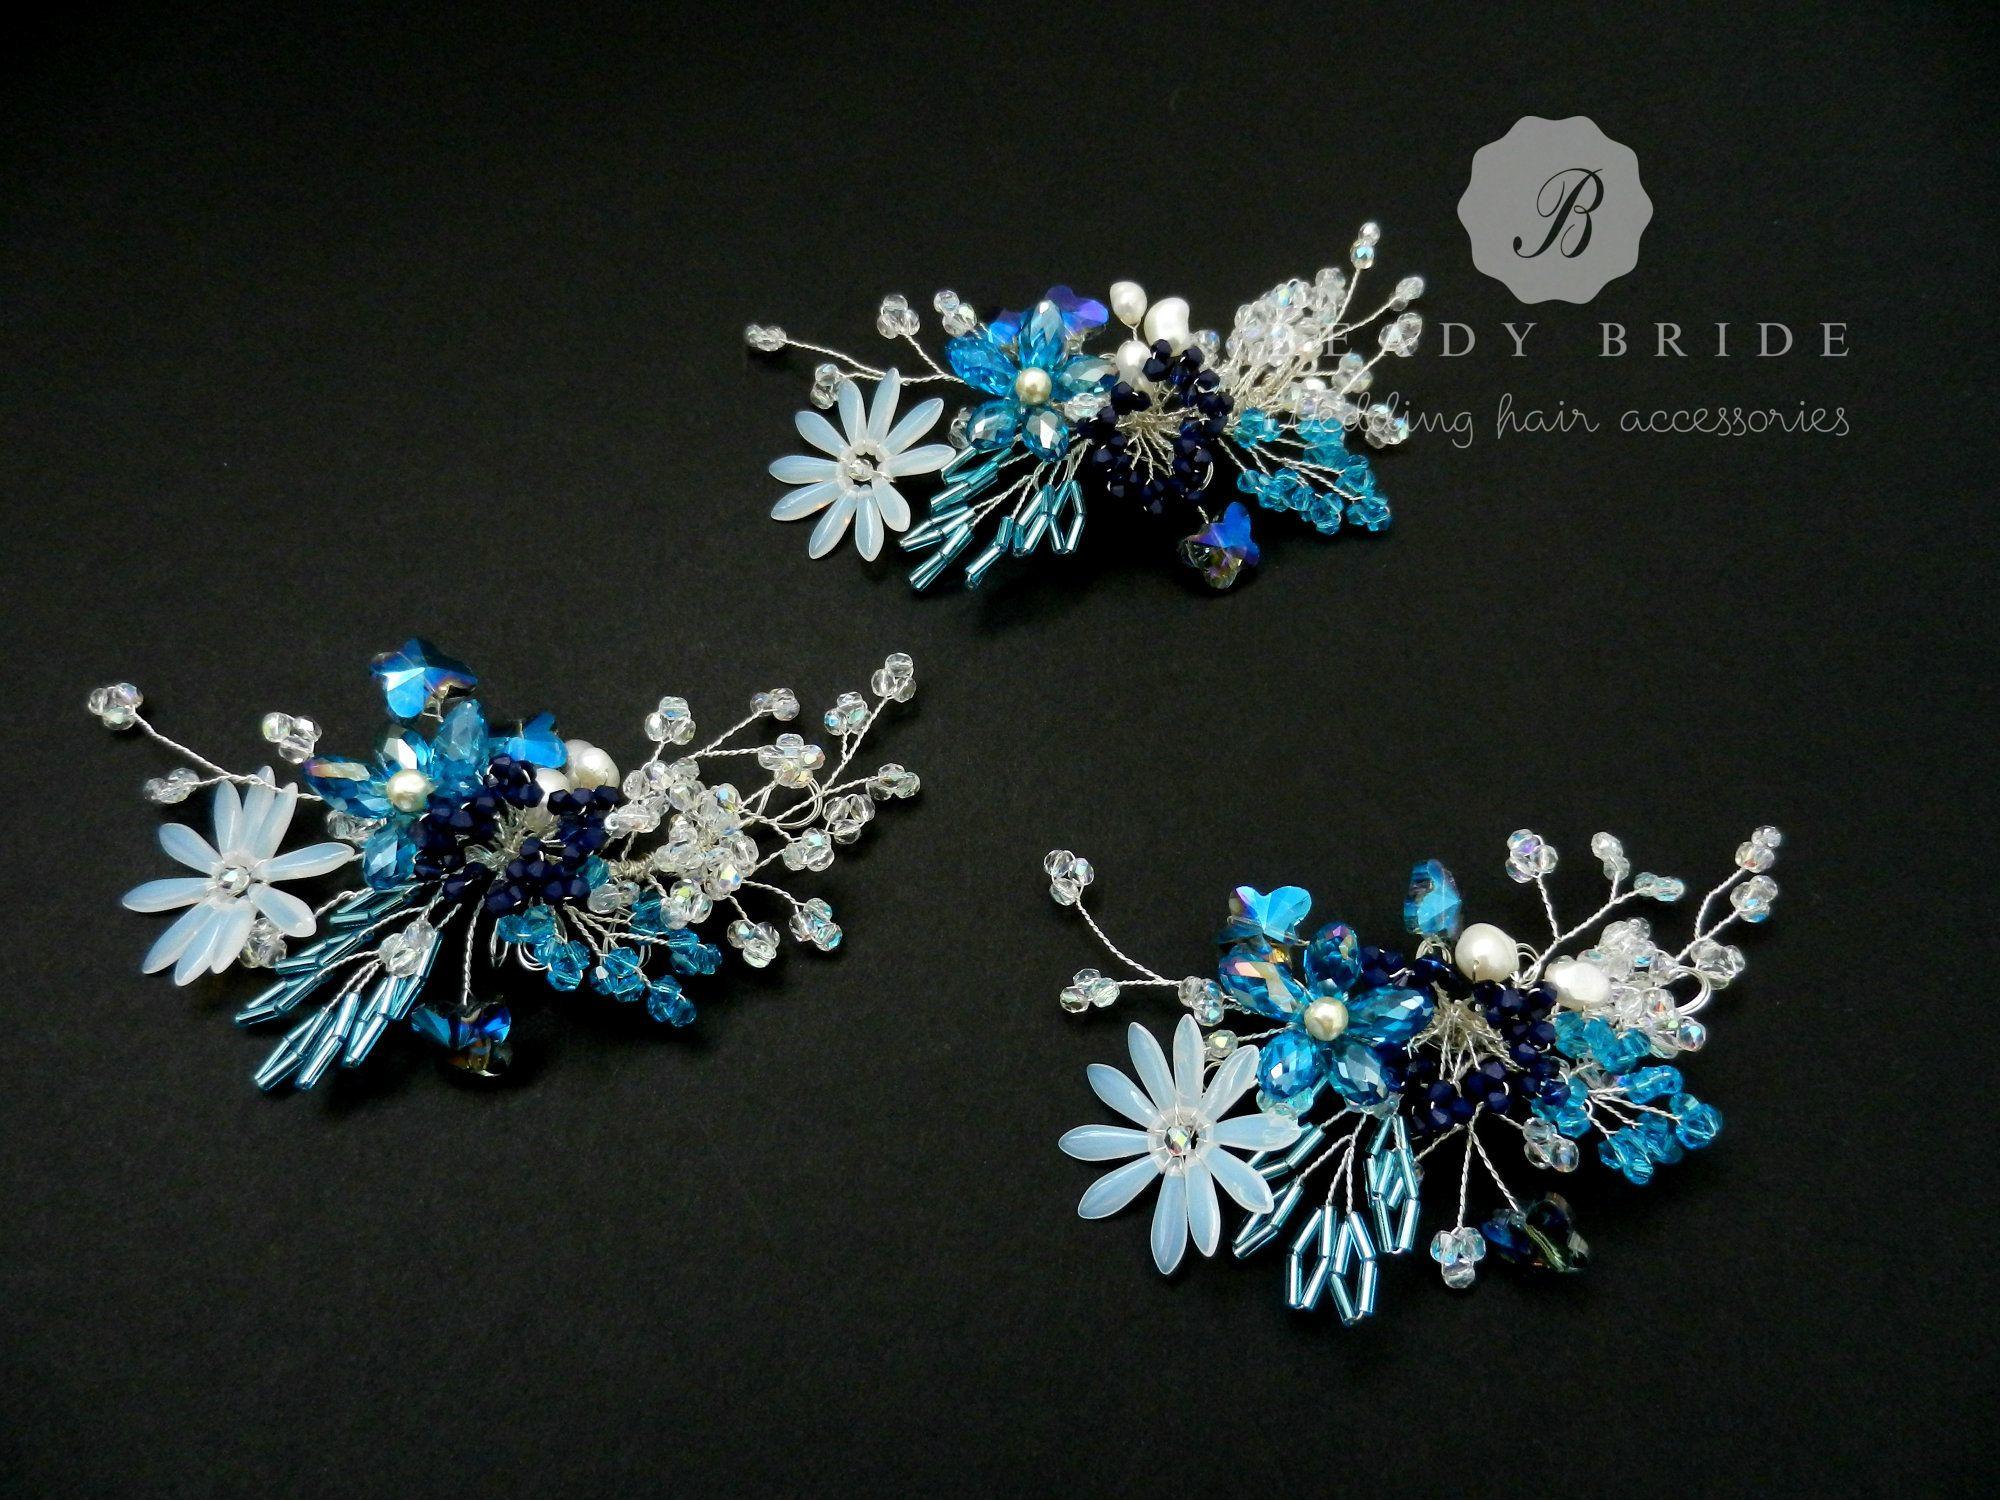 Joanna-blue bridesmaids hair accessory-by Beady Bride-UK